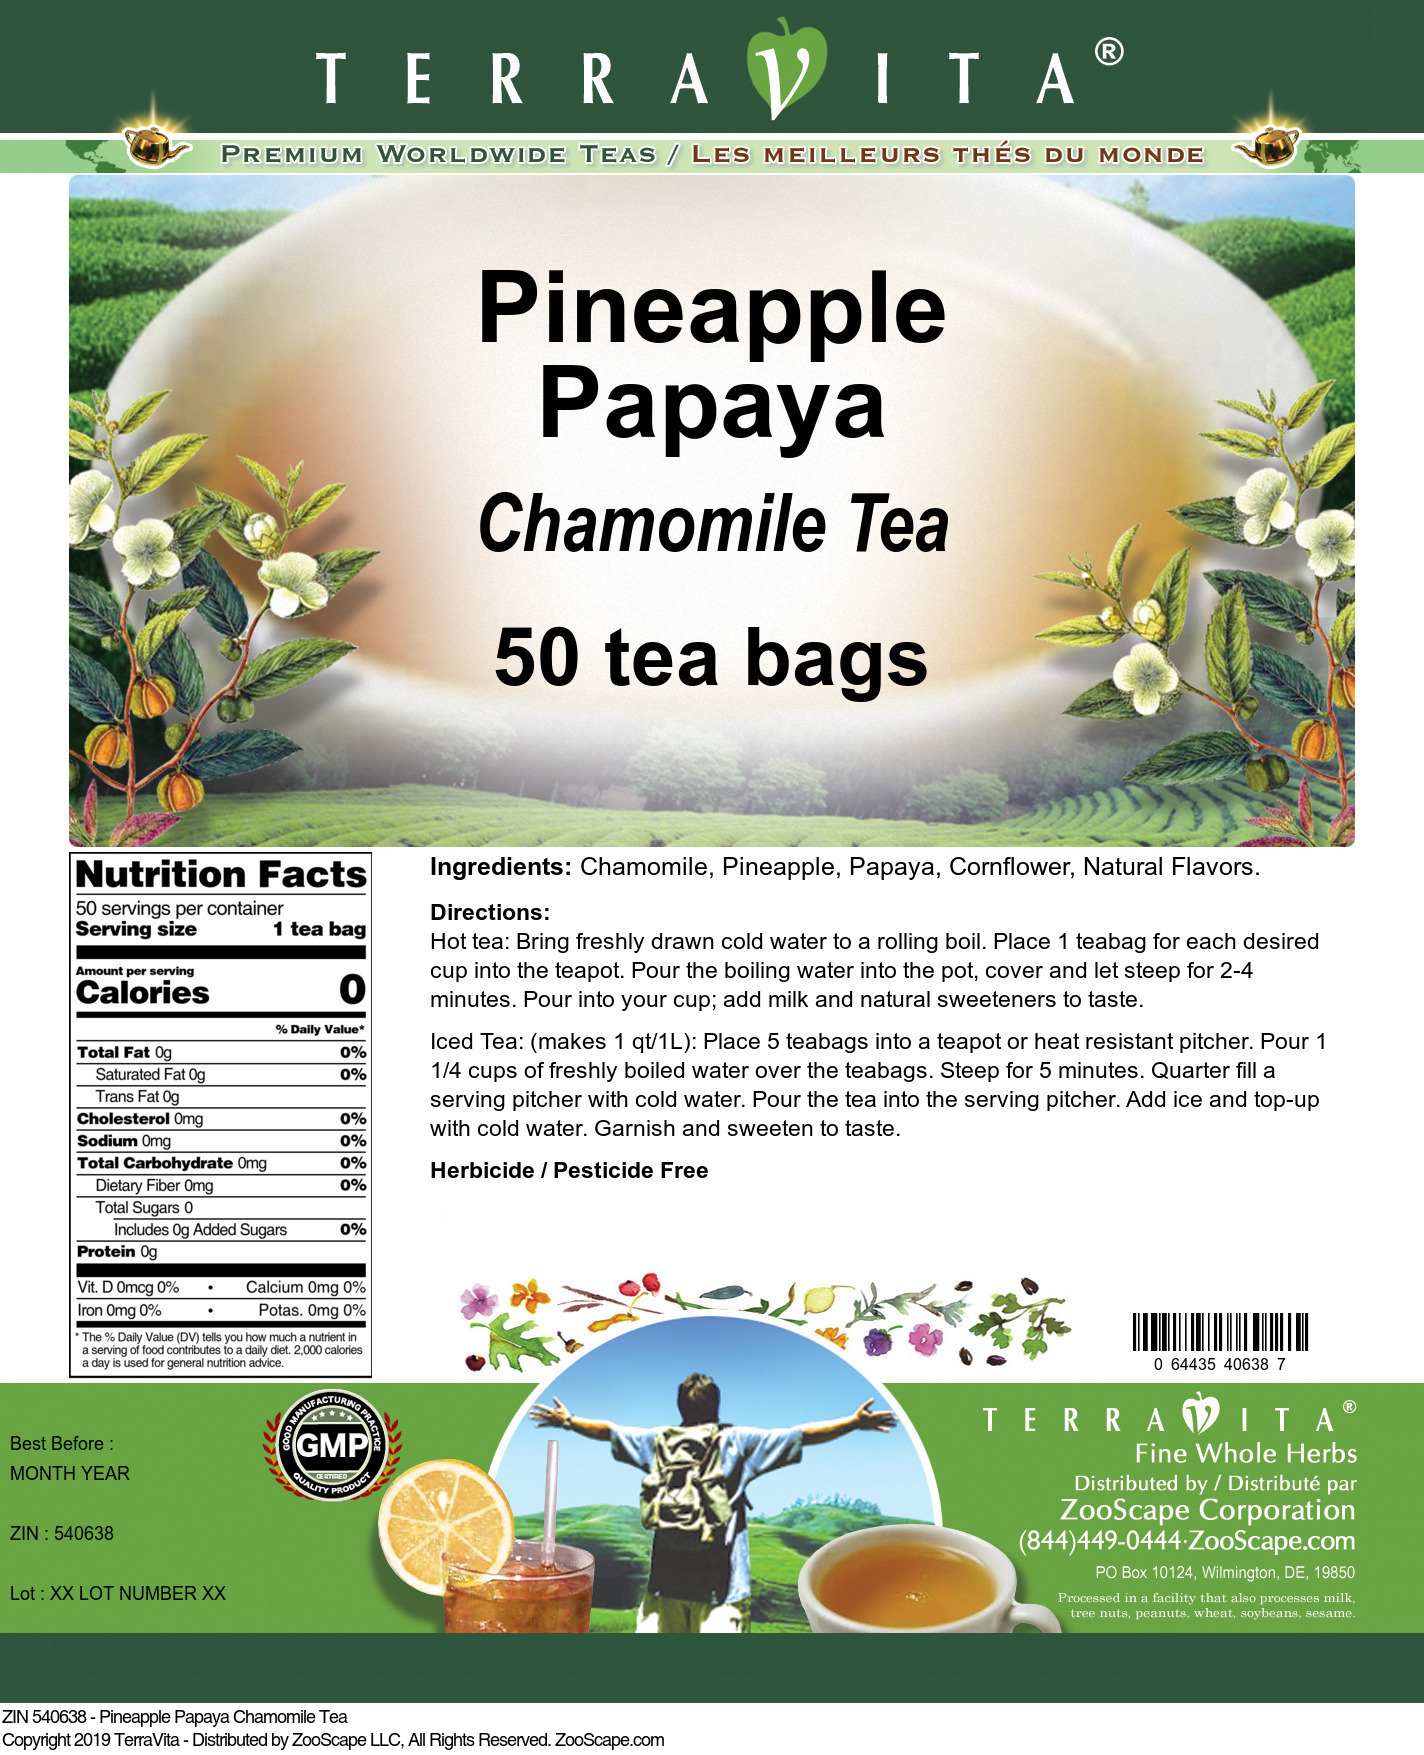 Pineapple Papaya Chamomile Tea